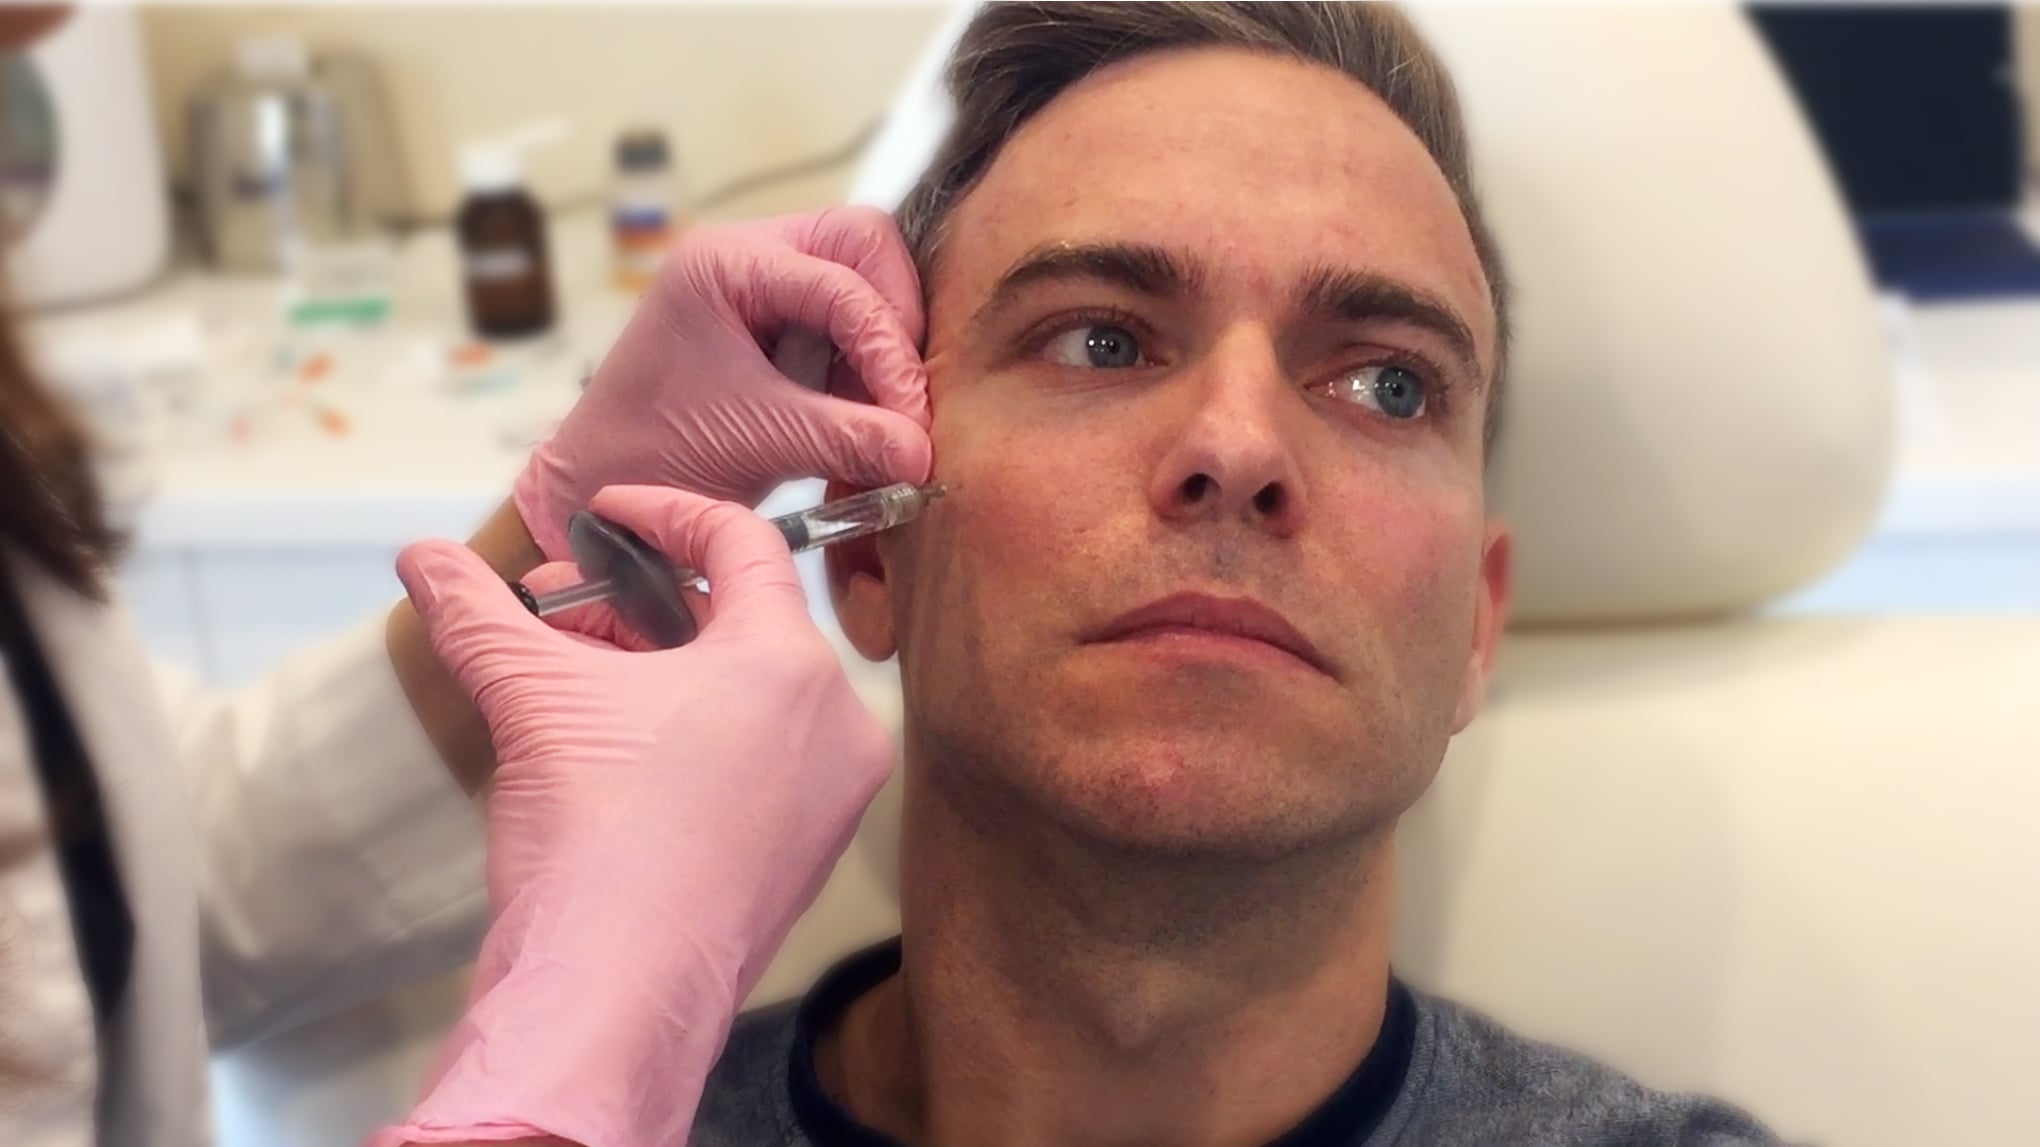 Tips For Men Getting Botox | POPSUGAR Beauty